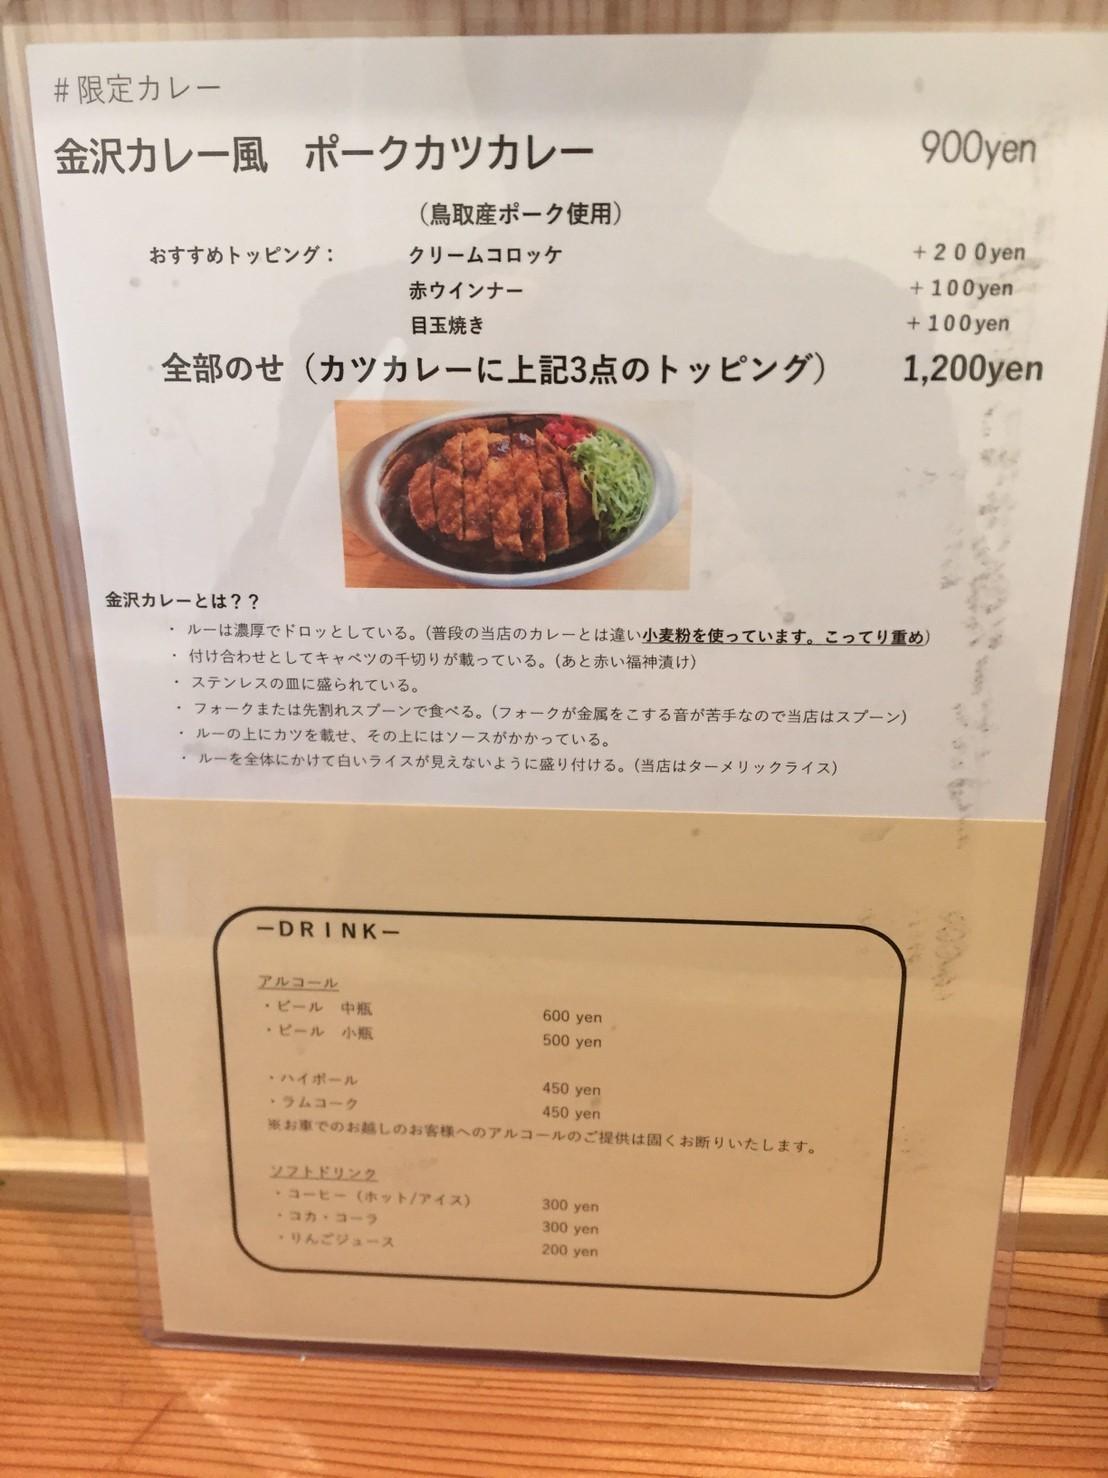 PARAKEET 限定カレー (金沢カレー風 ポークカツカレー)_e0115904_12403628.jpg